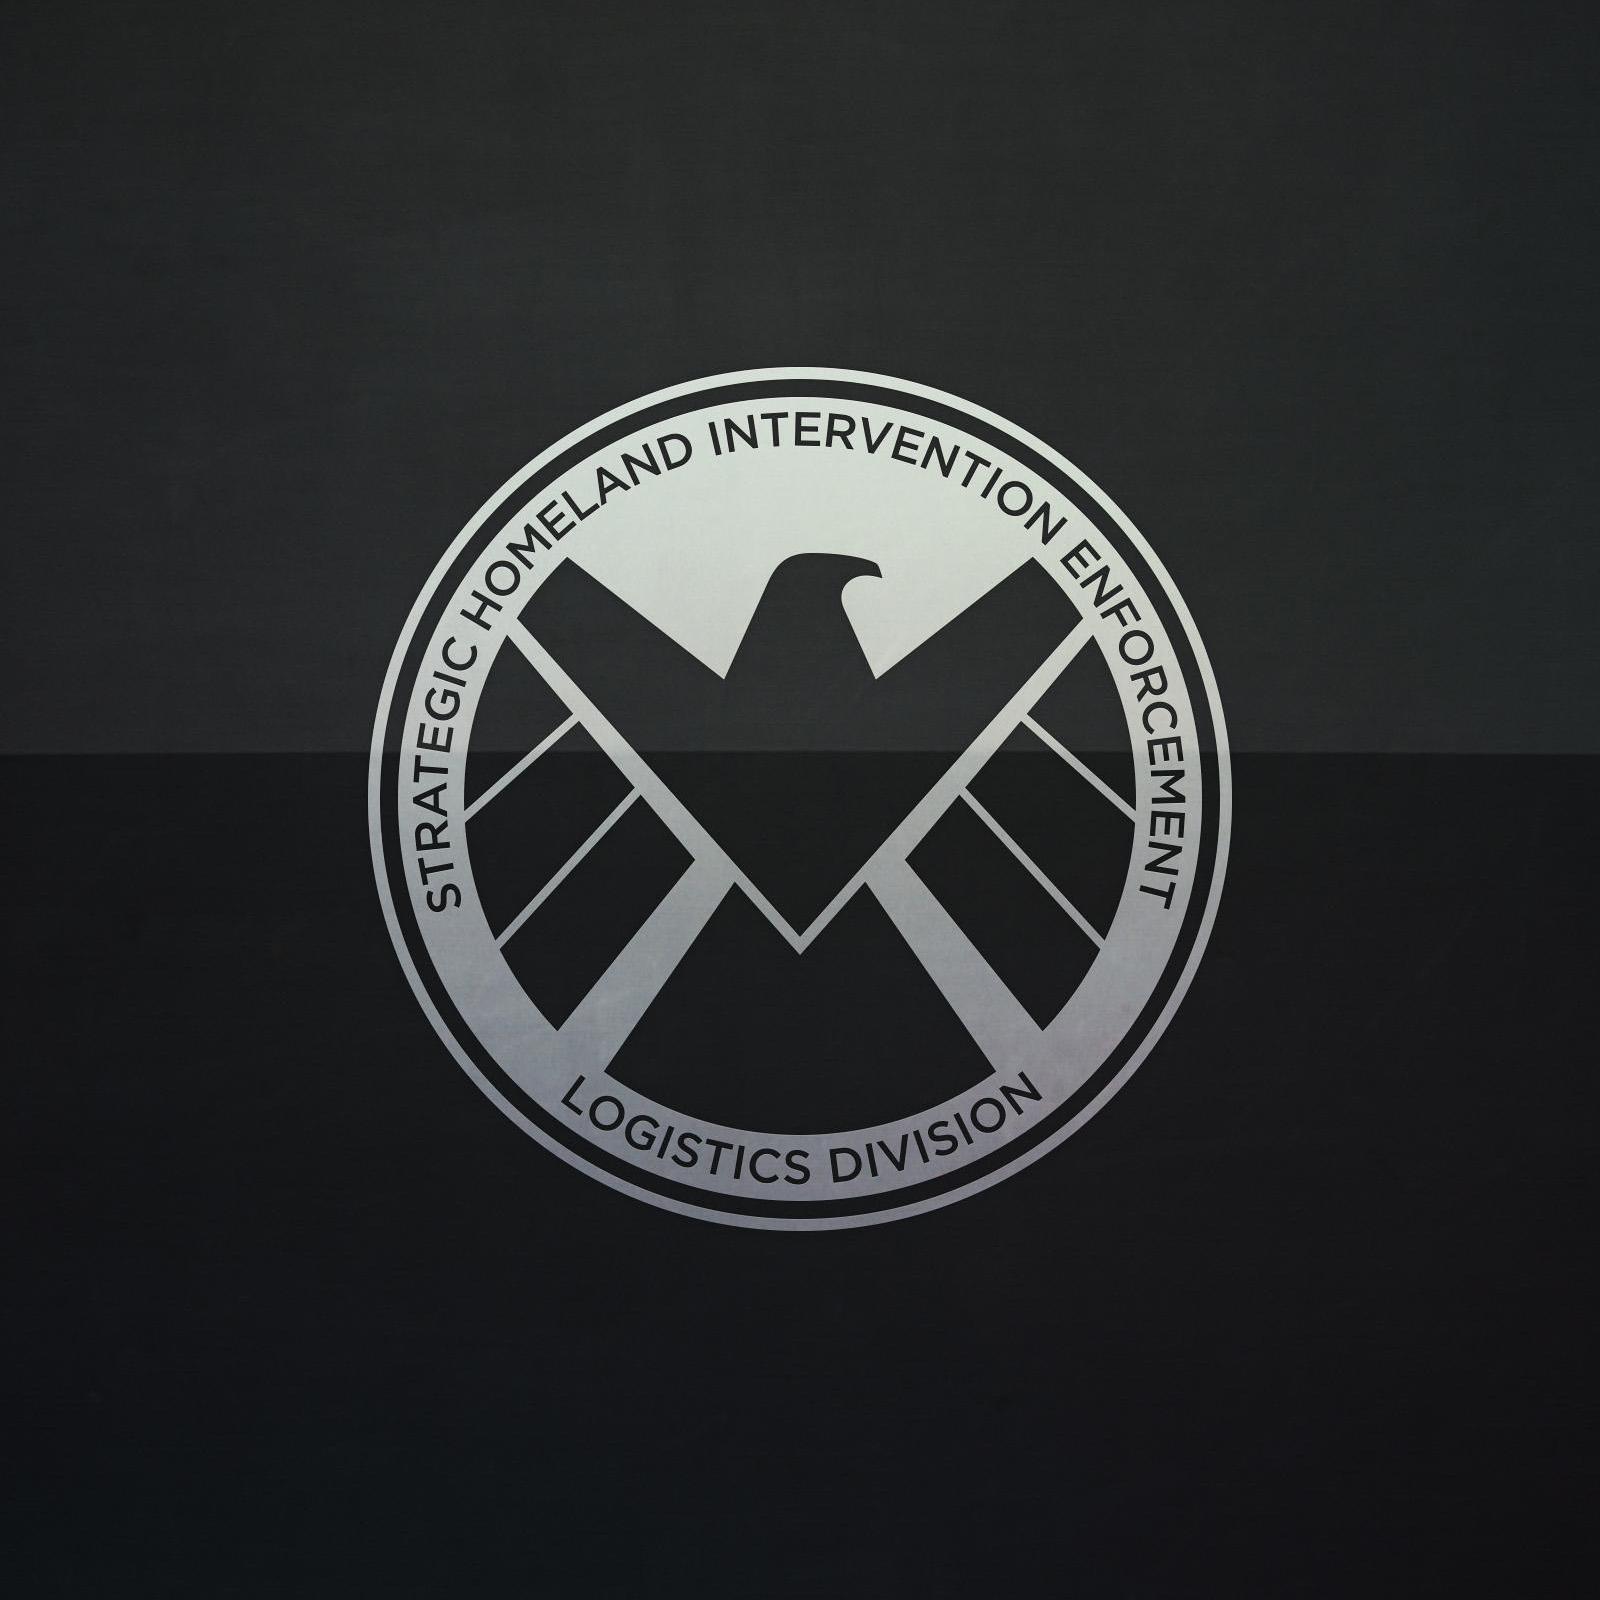 Agents of S.H.I.E.L.D 17화를 위한 월페이퍼